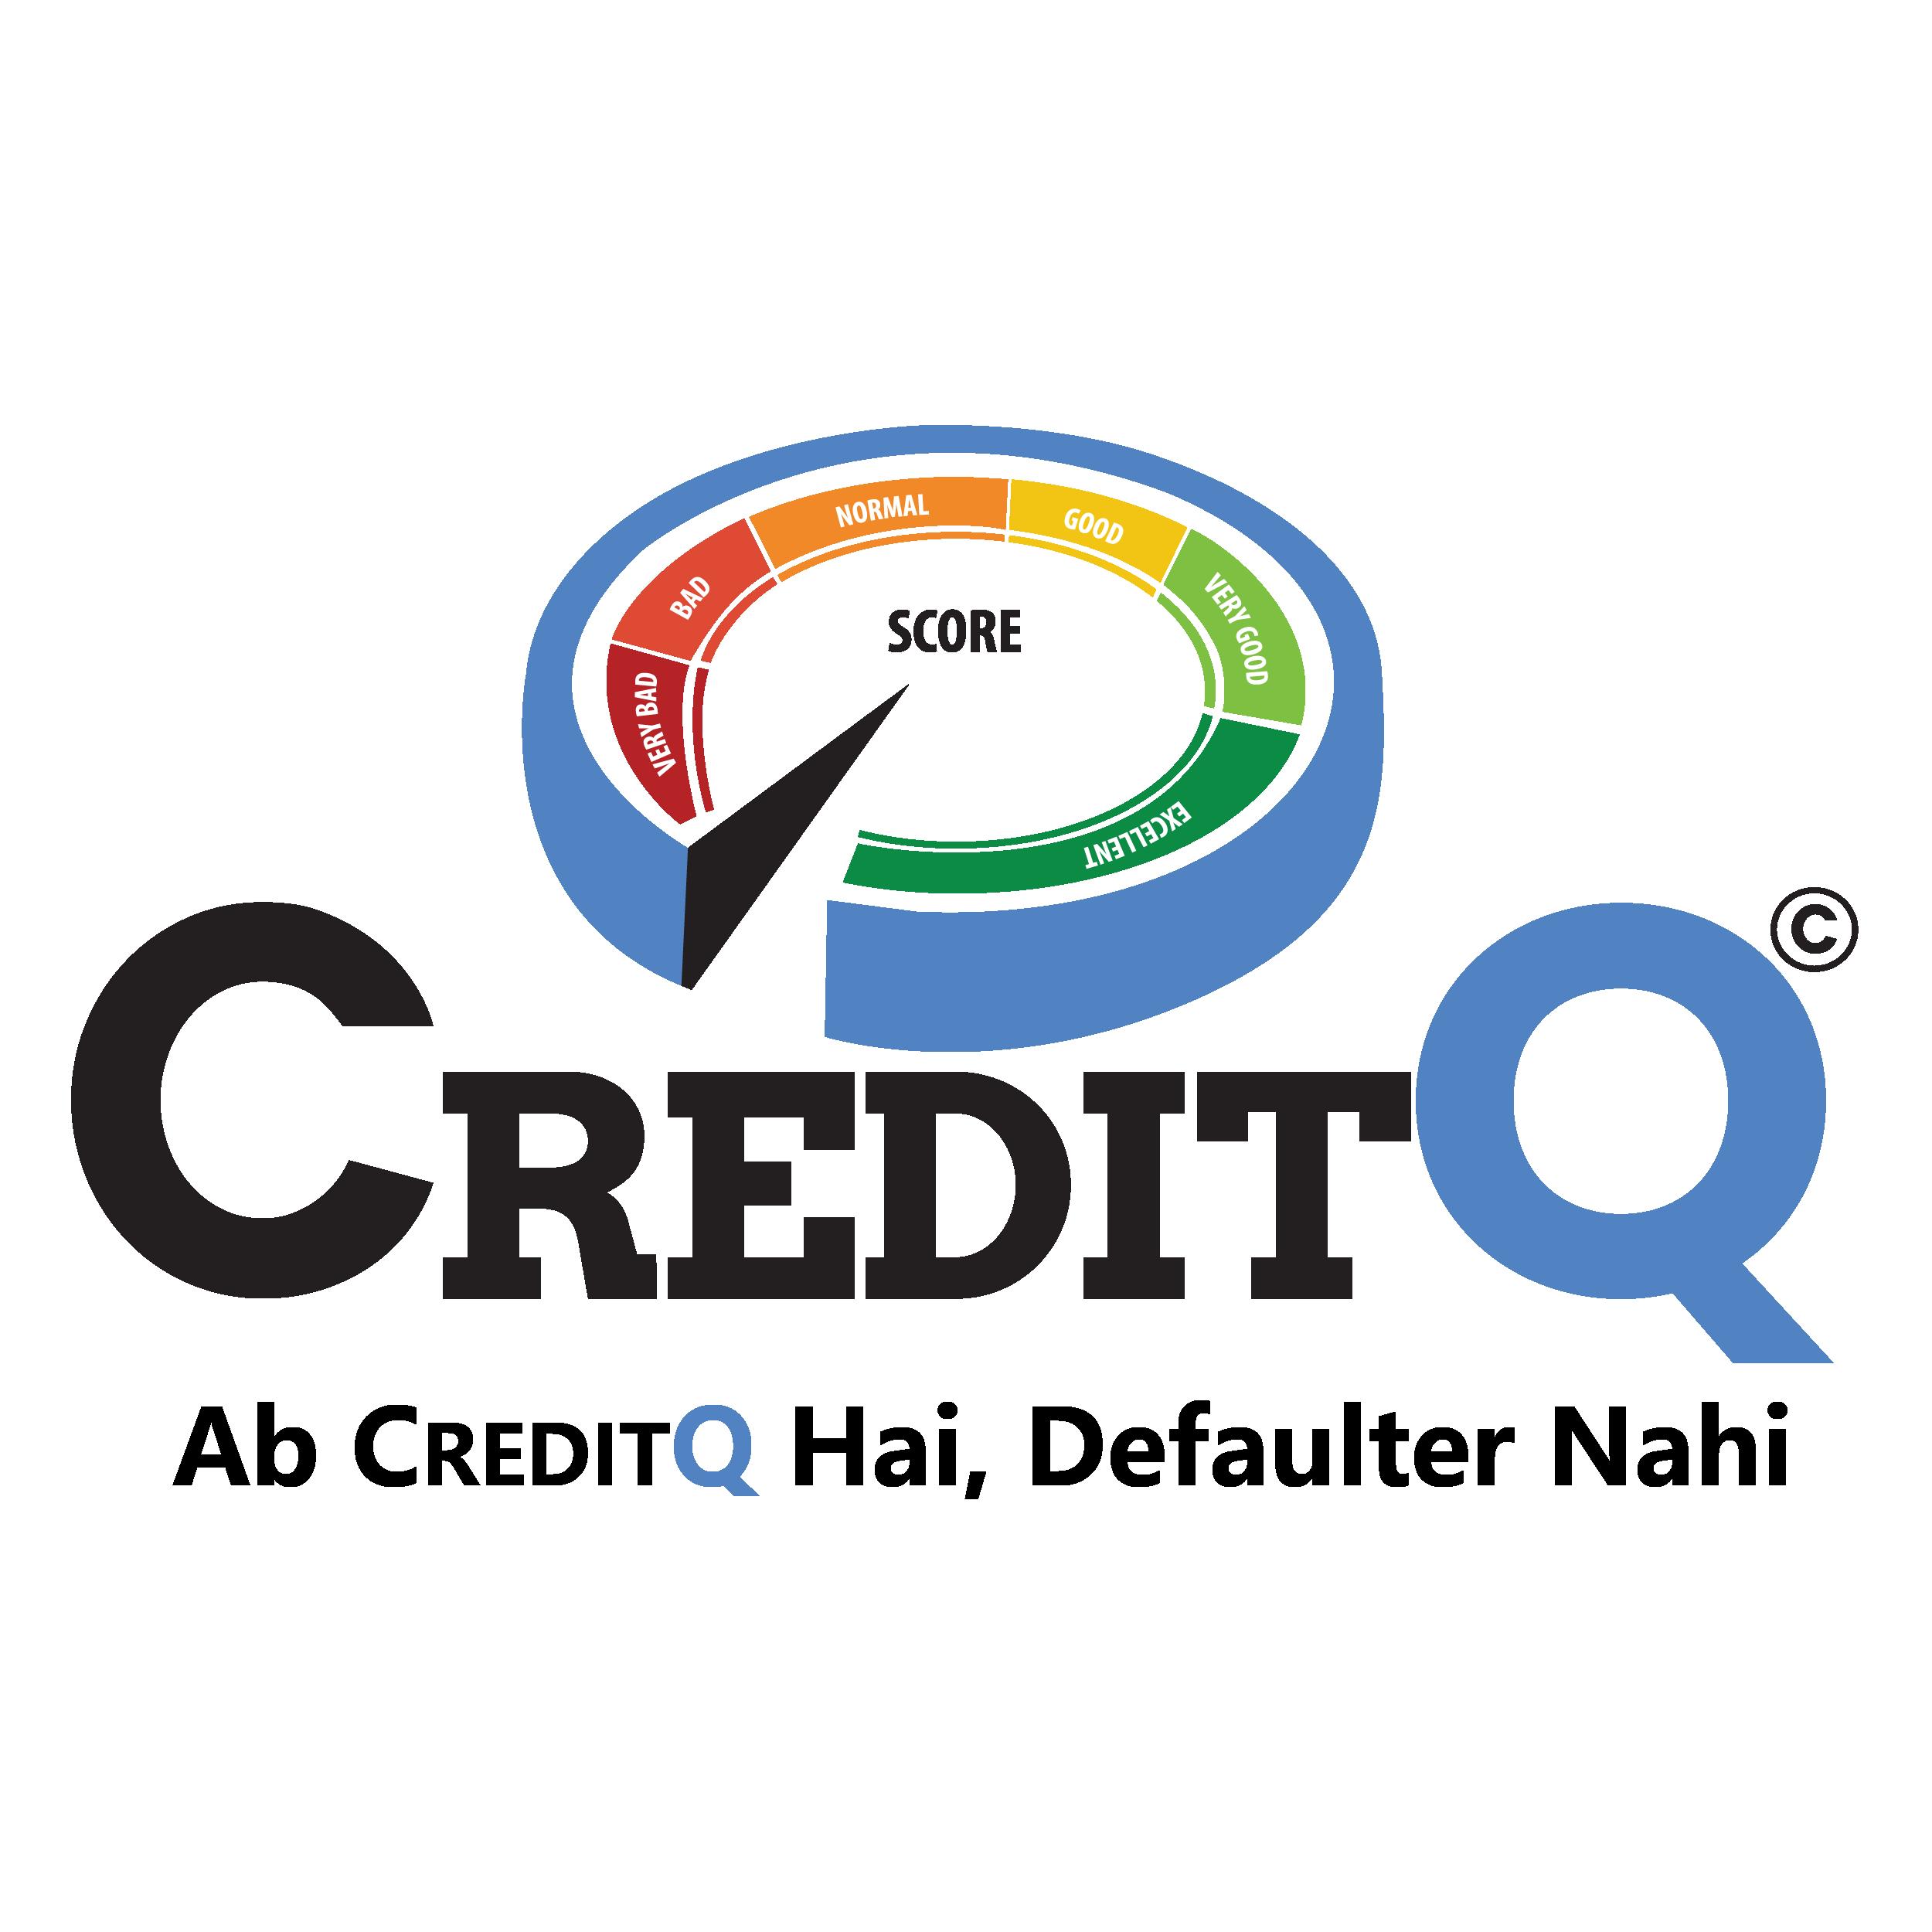 20995creditq-logo.png